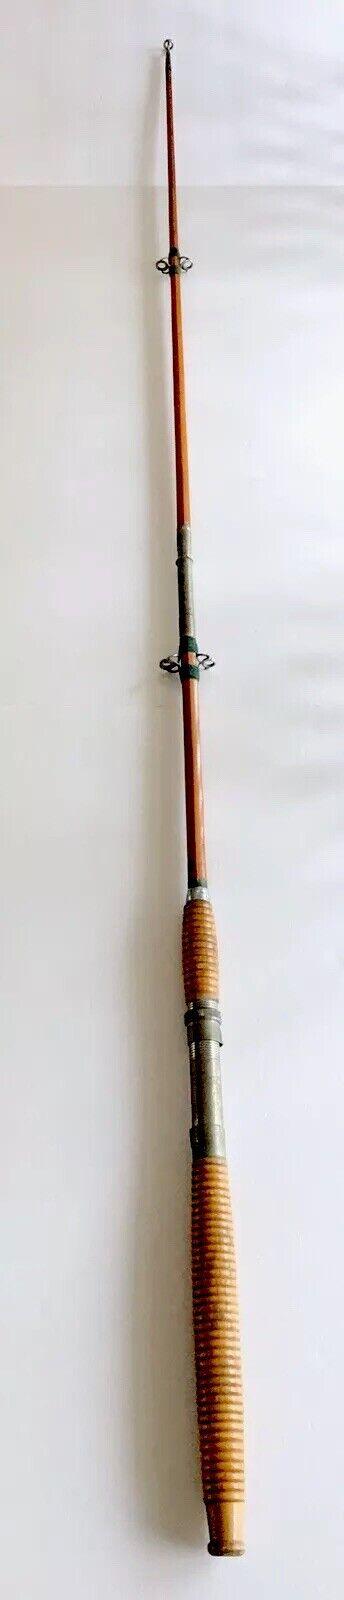 Antigüedades   antigüedades JC Higgins, surf   muelle   caña de pesCoche - 5 - 8